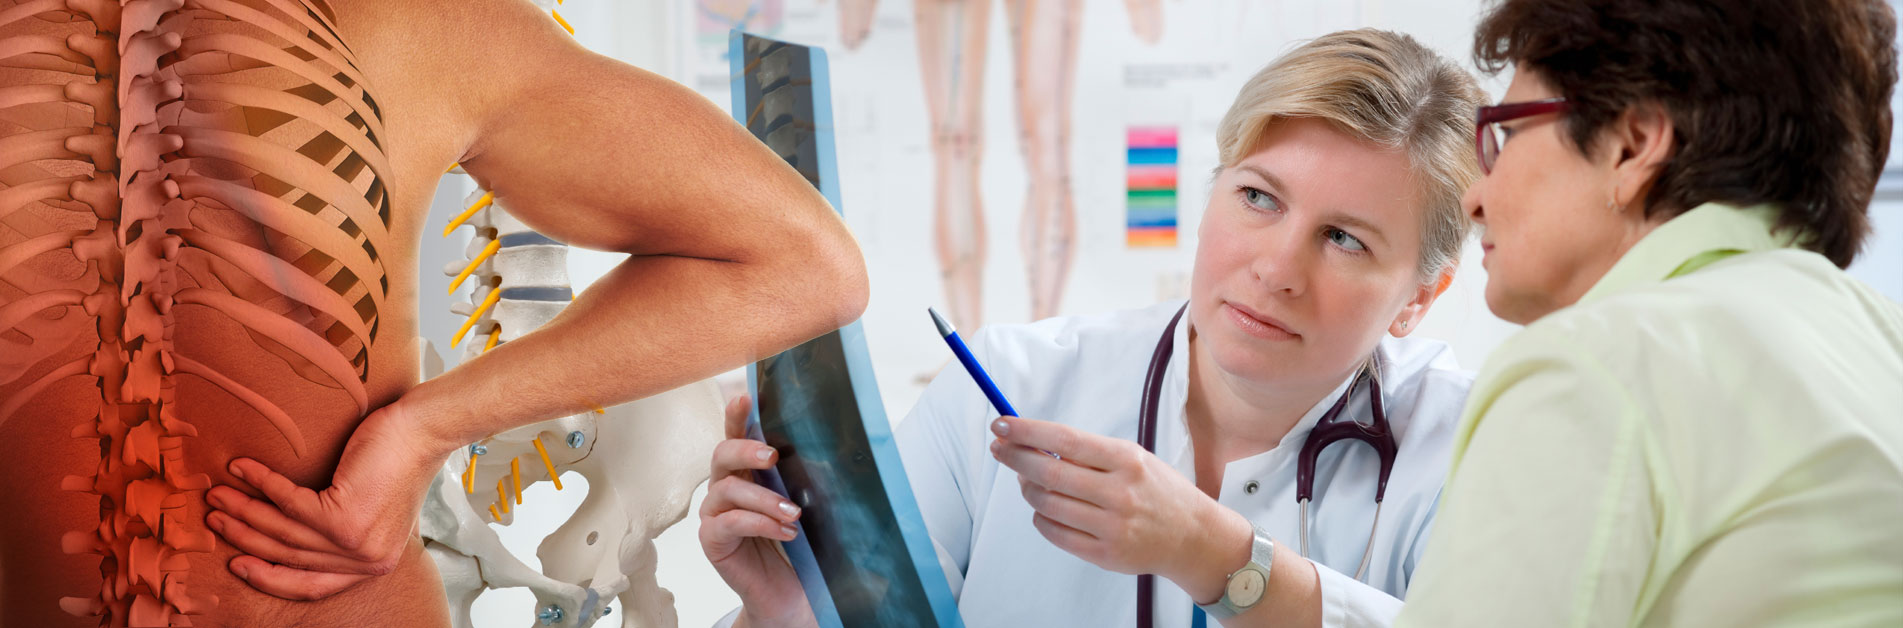 Stephen Hipkiss - Registered Osteopath